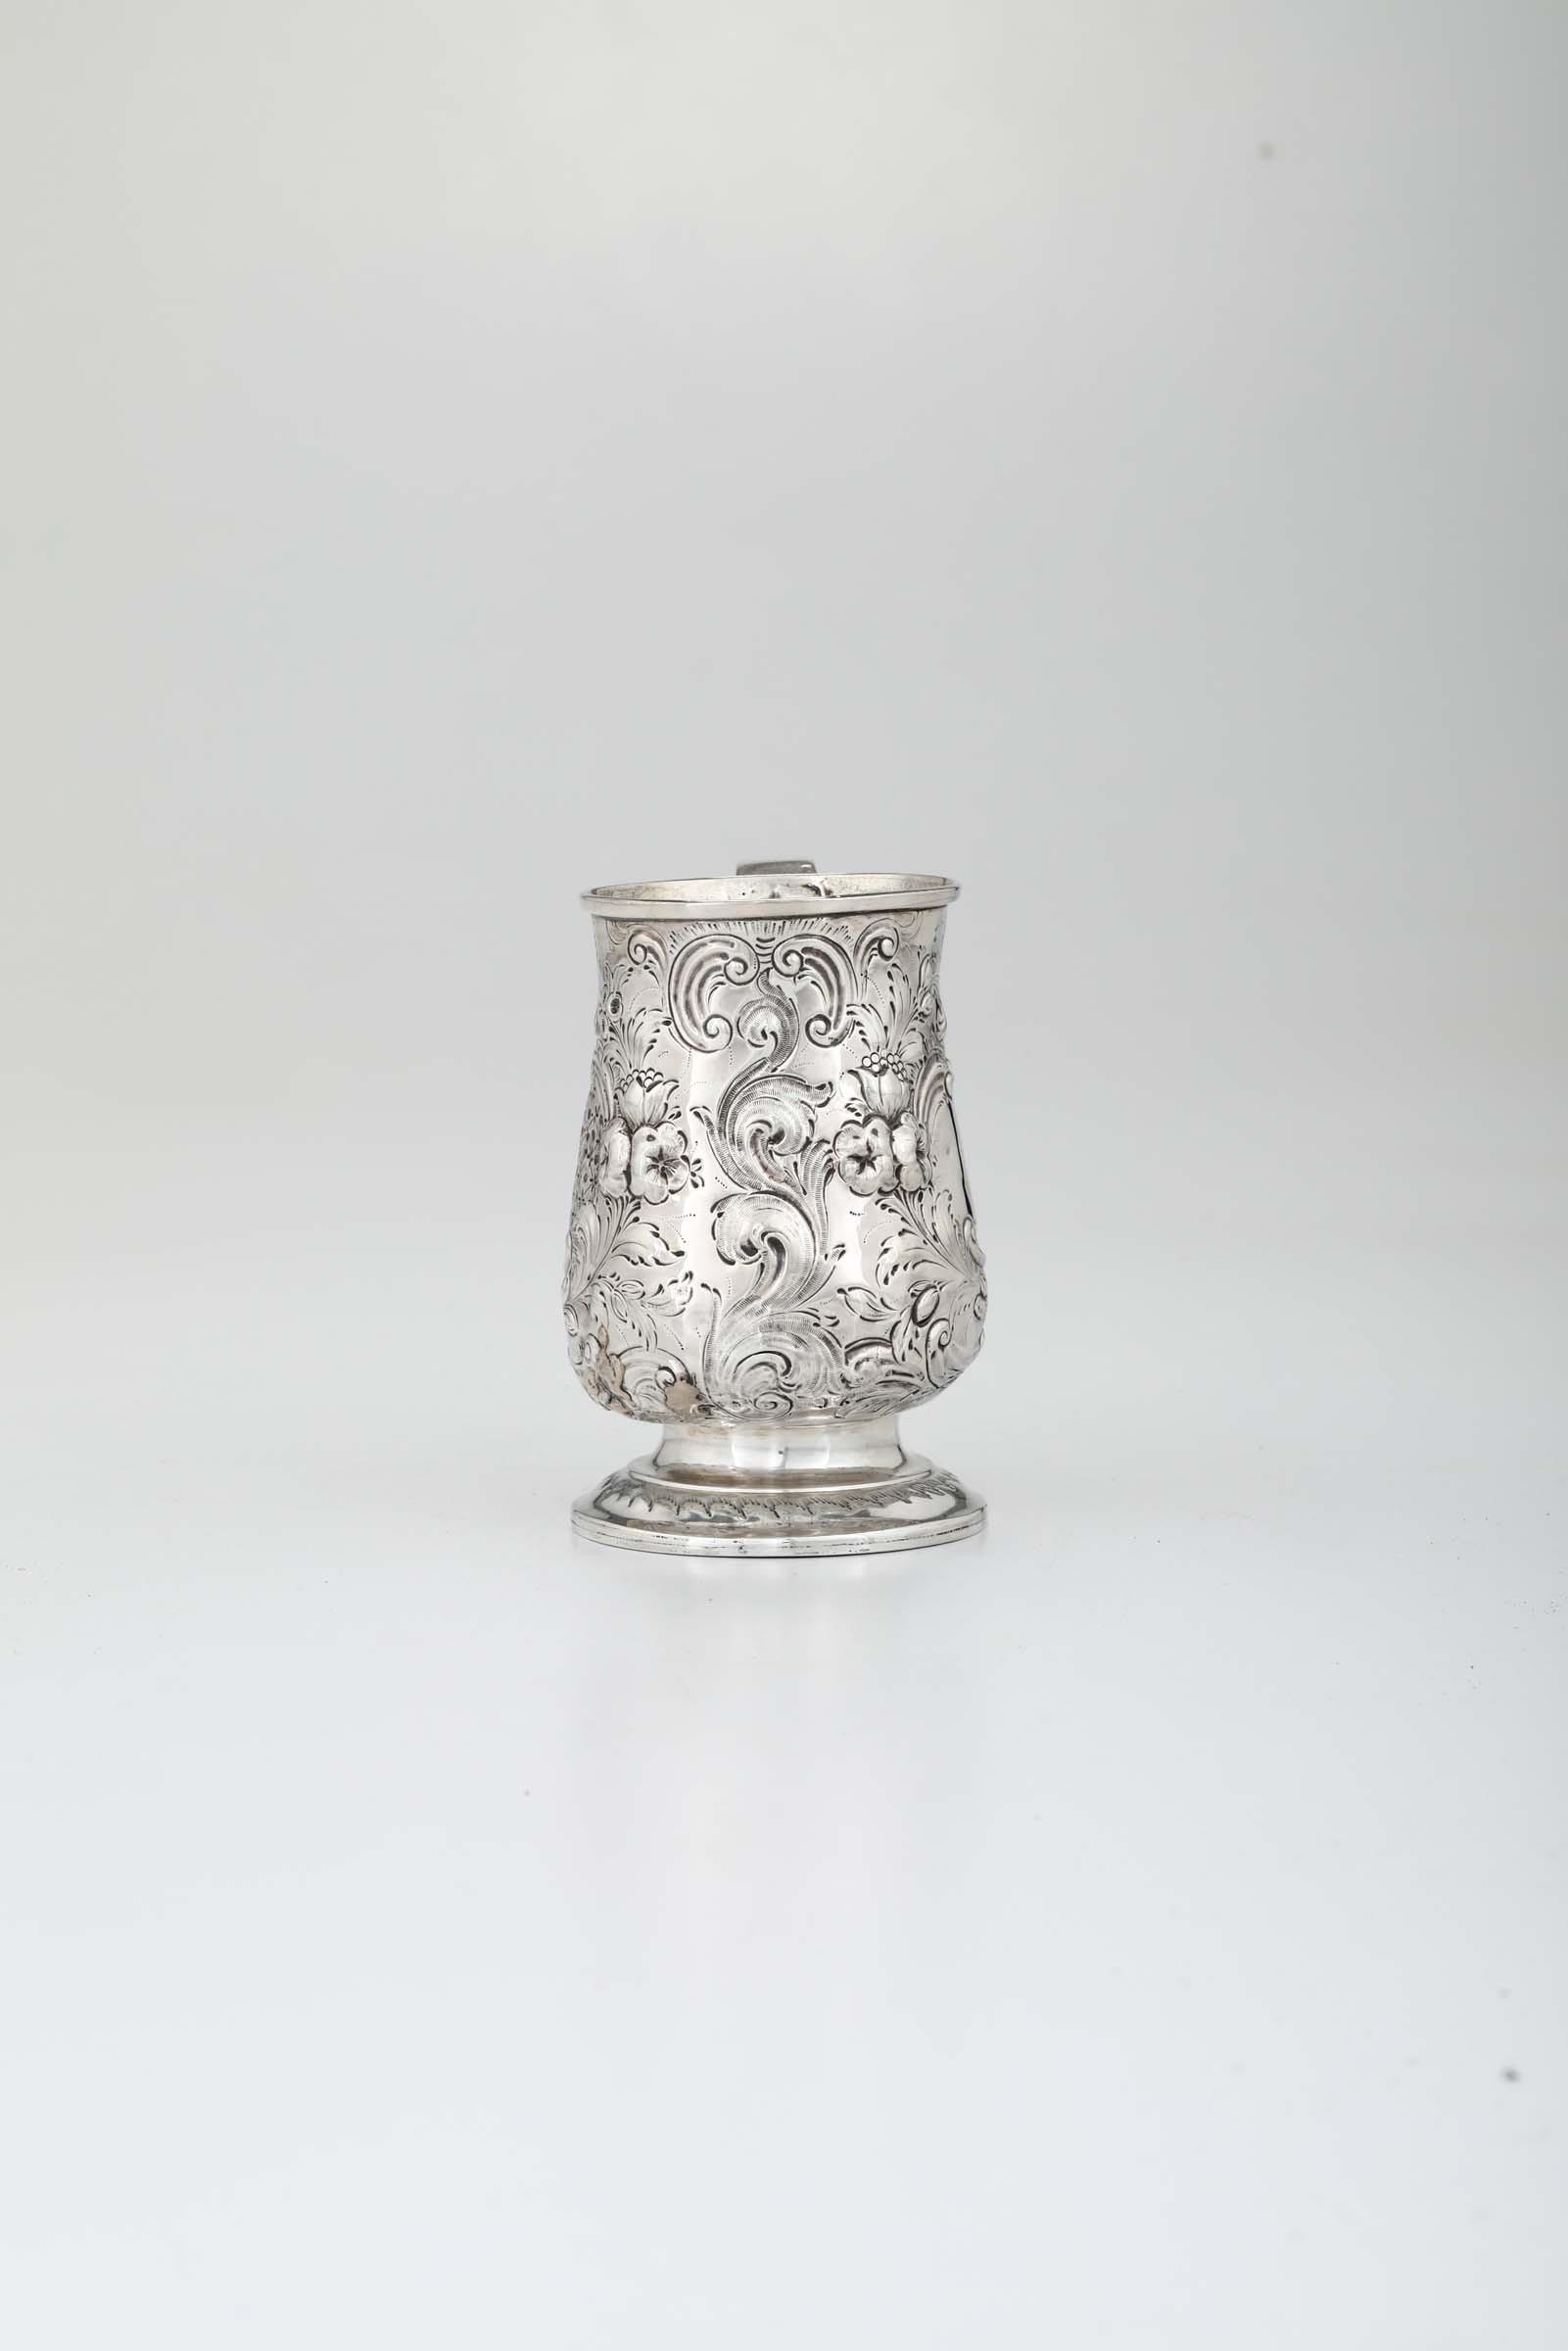 A silver tankard, London, 1759 - H 13.3cm, 260gr - - Image 2 of 3